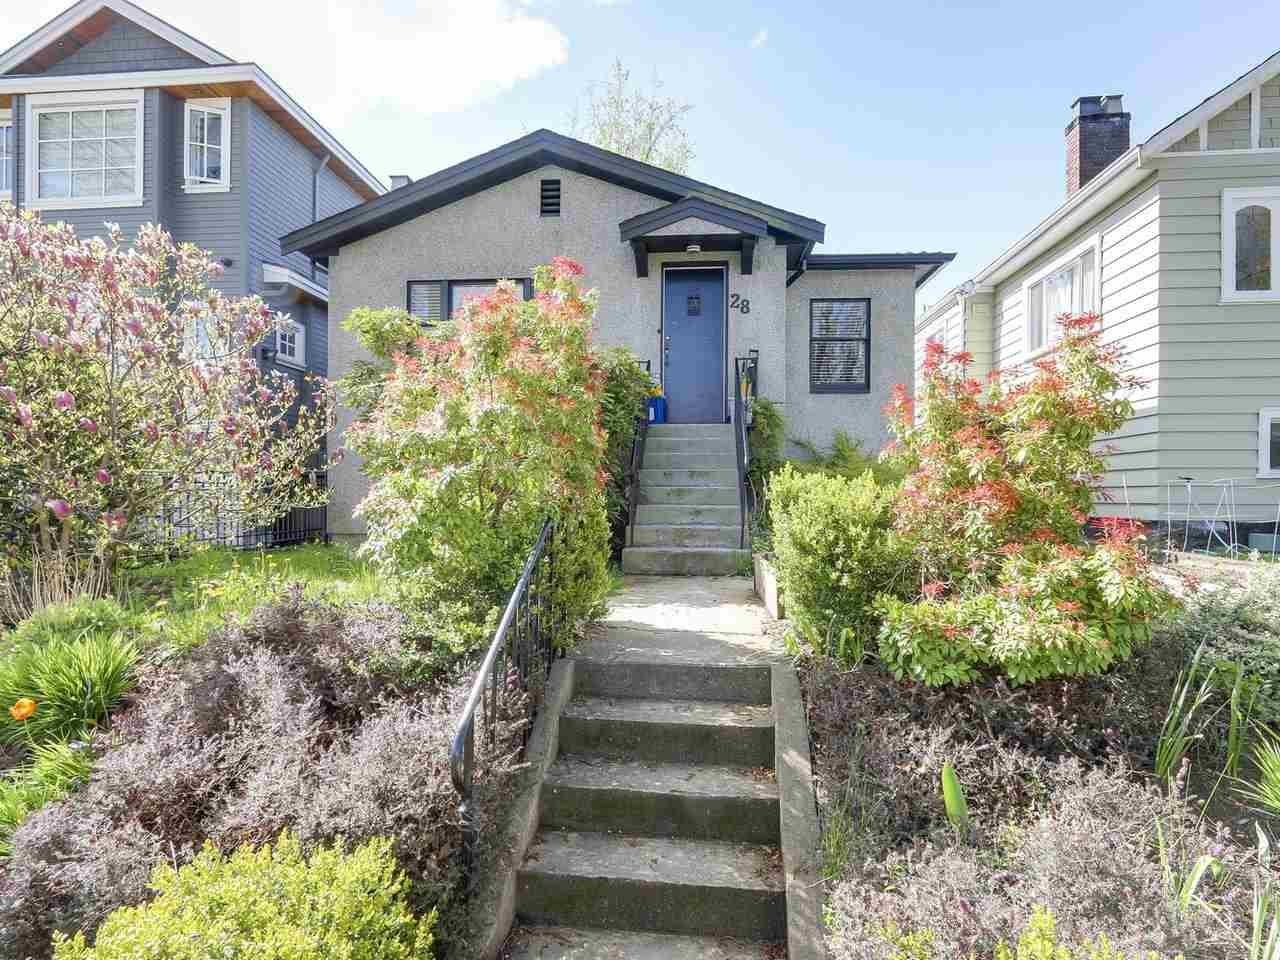 R2161603 - 28 E 19TH AVENUE, Main, Vancouver, BC - House/Single Family